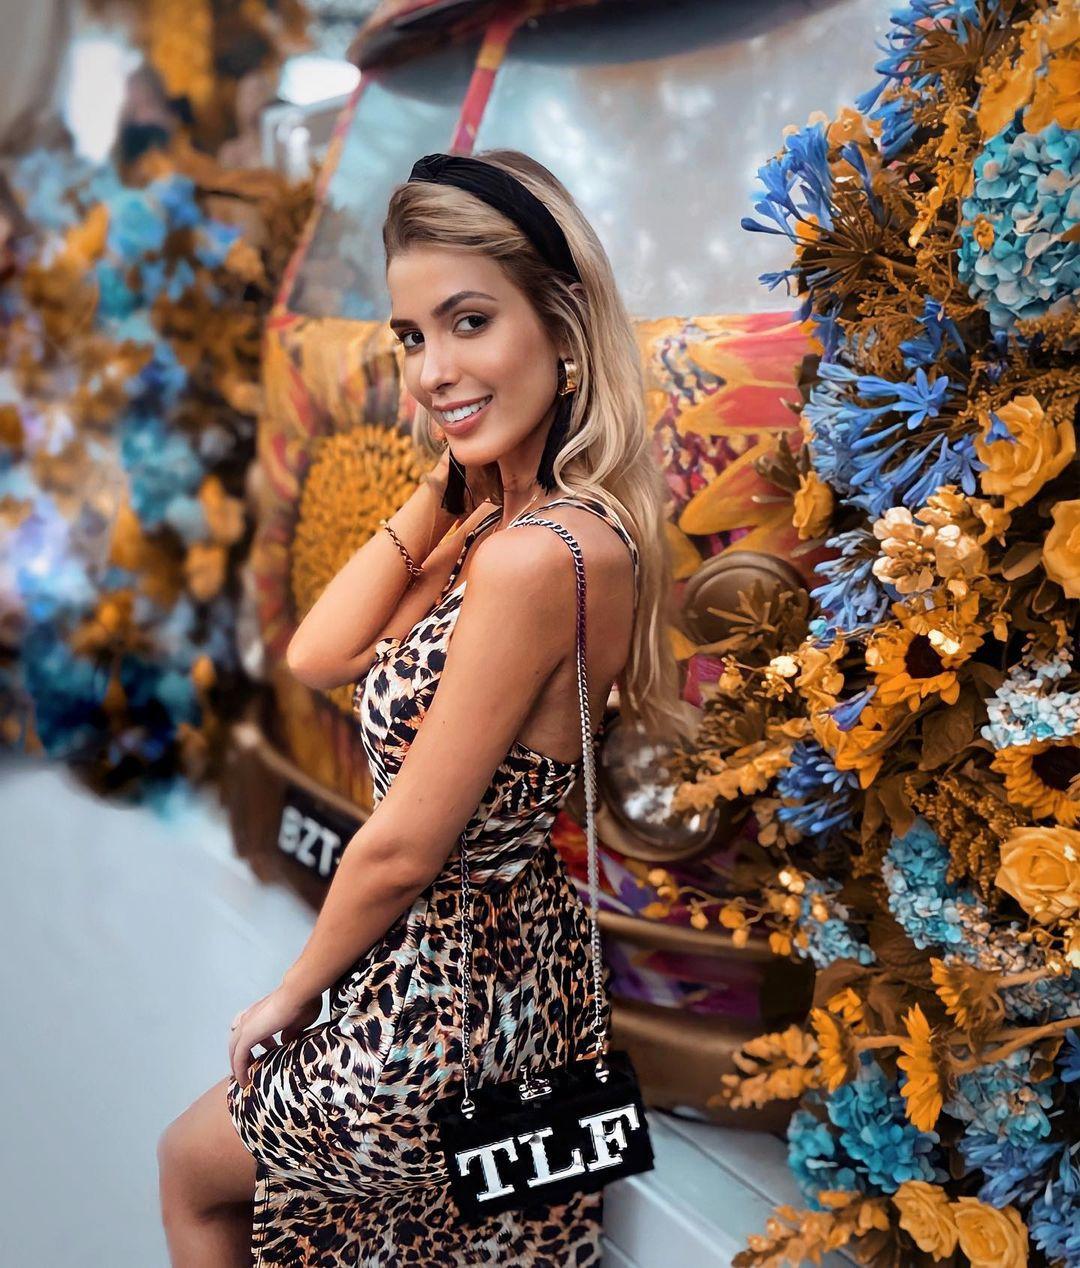 taina laydner, miss eco brasil 2019. - Página 7 Fm7woq10